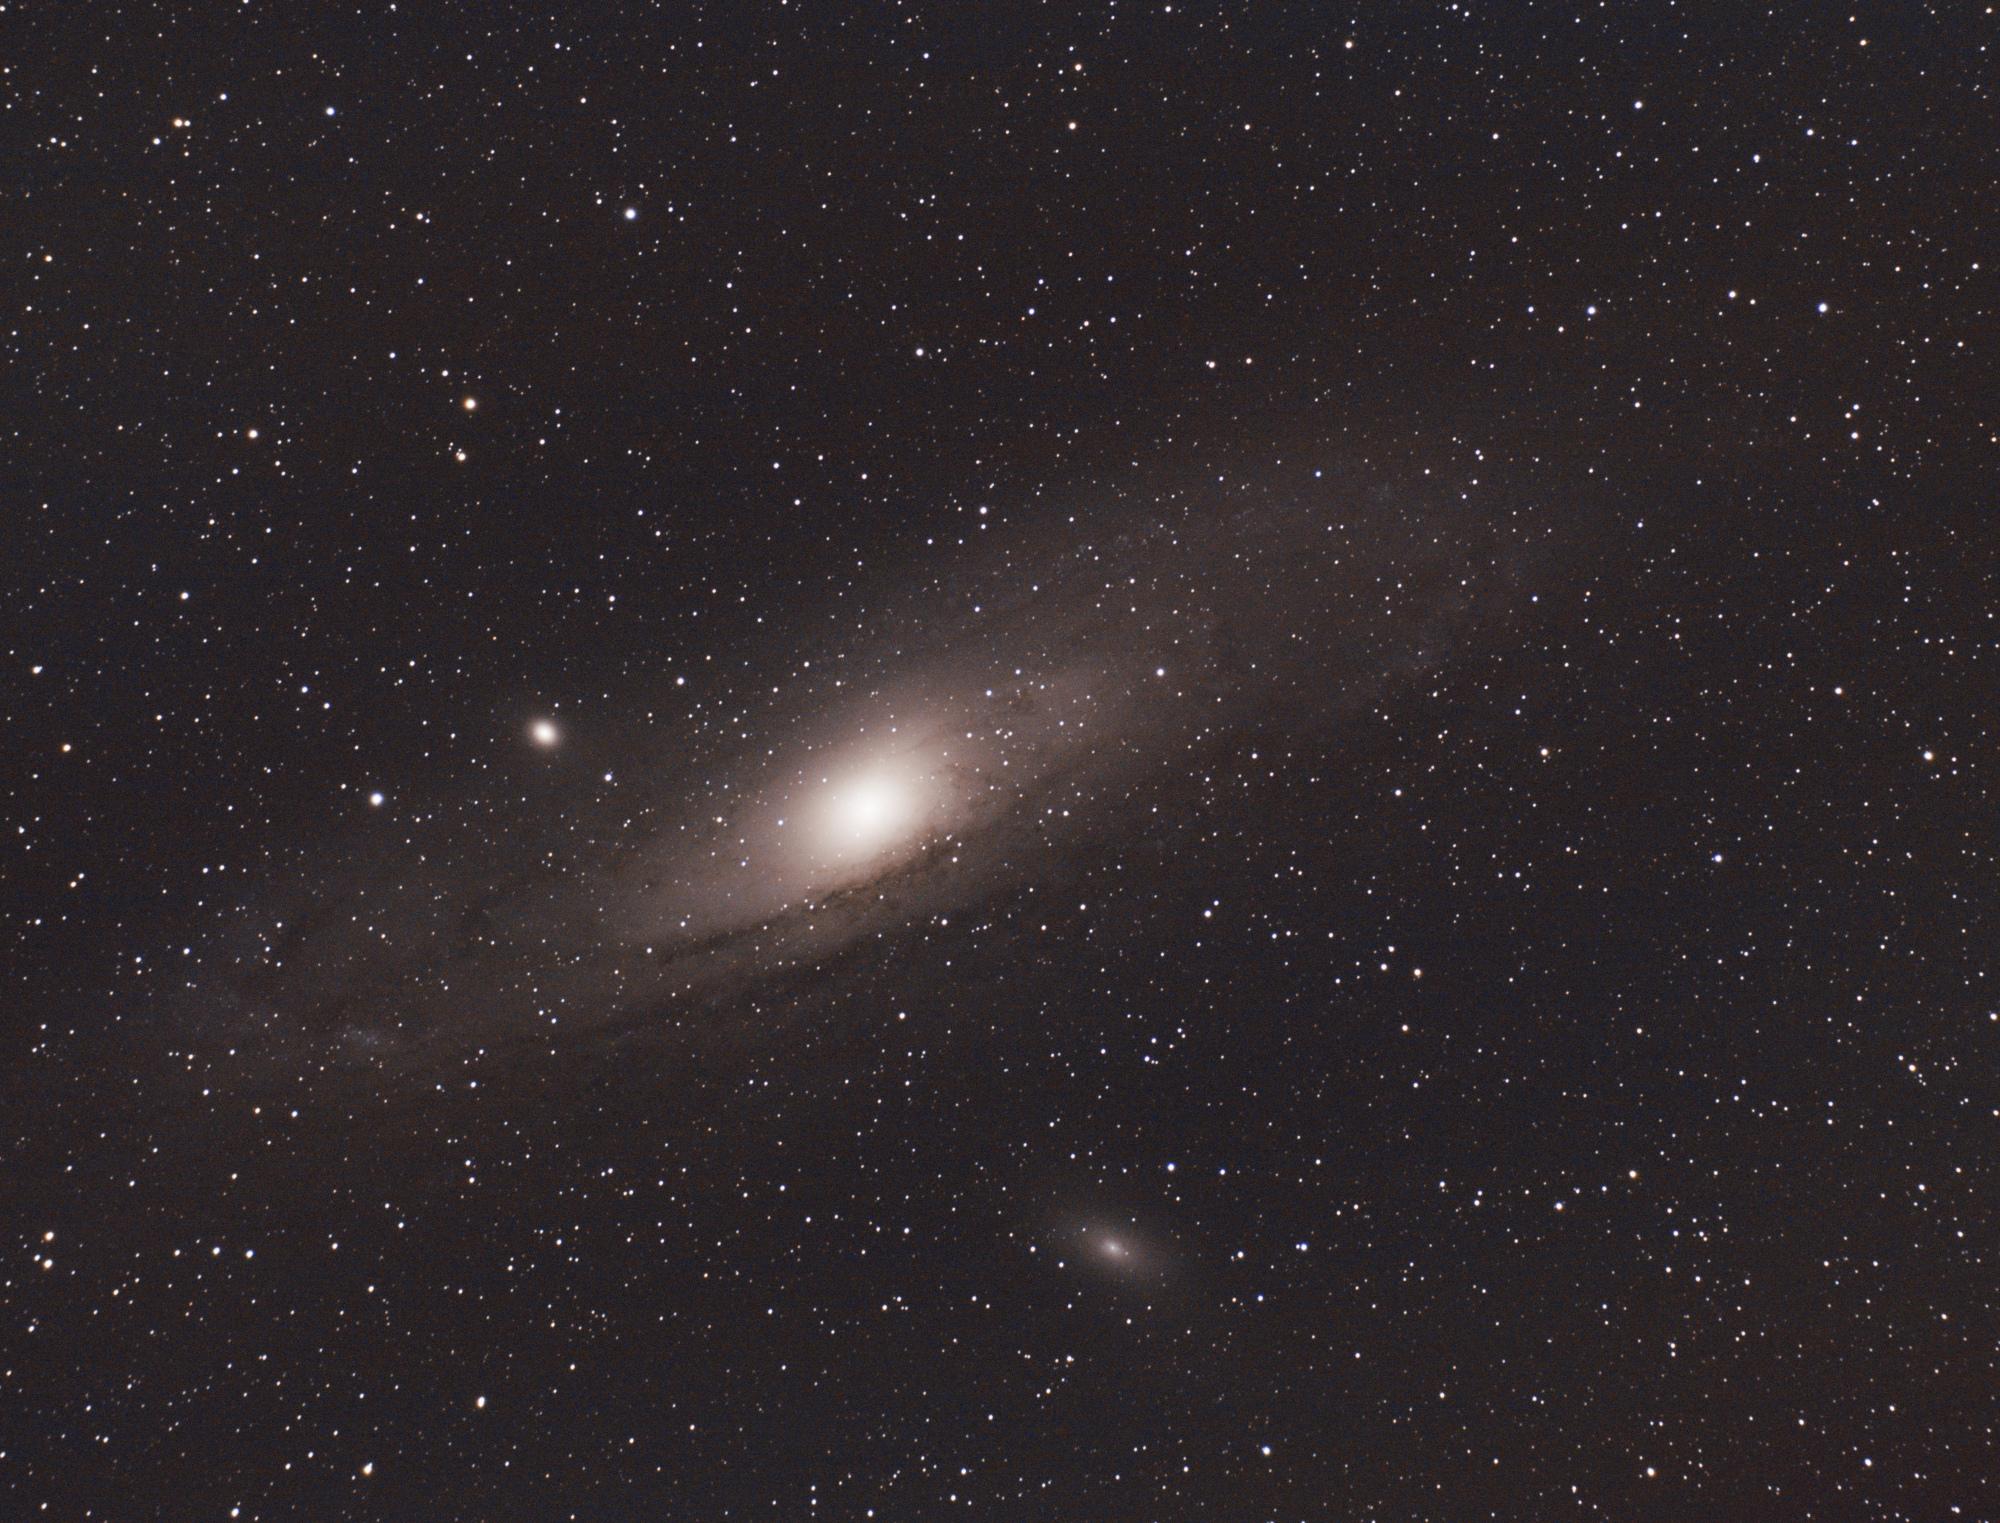 M31_ESSAI8.thumb.jpg.bced4c99e7b65048cb1c7dcc8c4a4f38.jpg